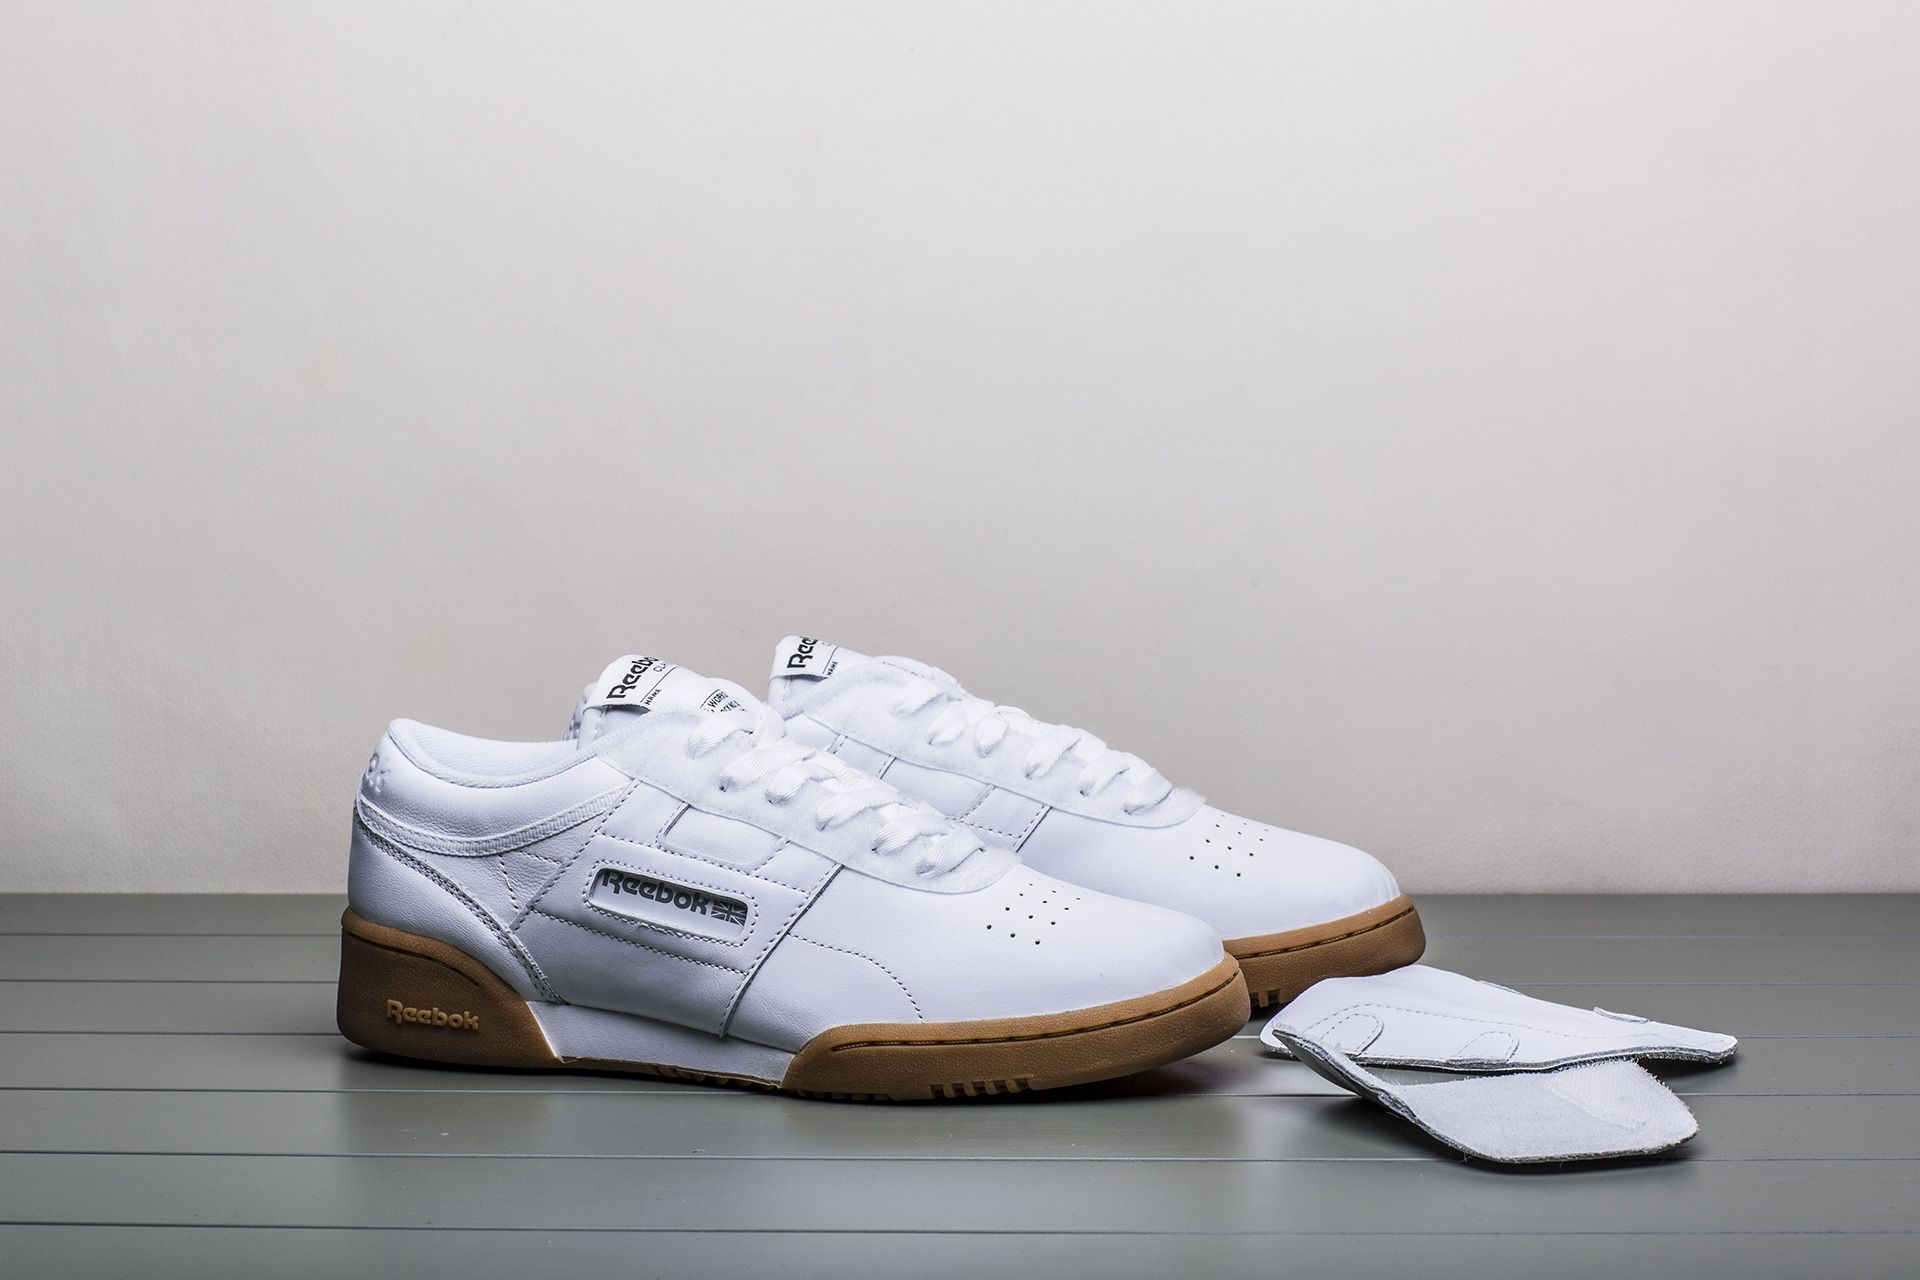 bf2819969deb6 Купить белые мужские кроссовки Workout LO Clean Beams от Reebok ...